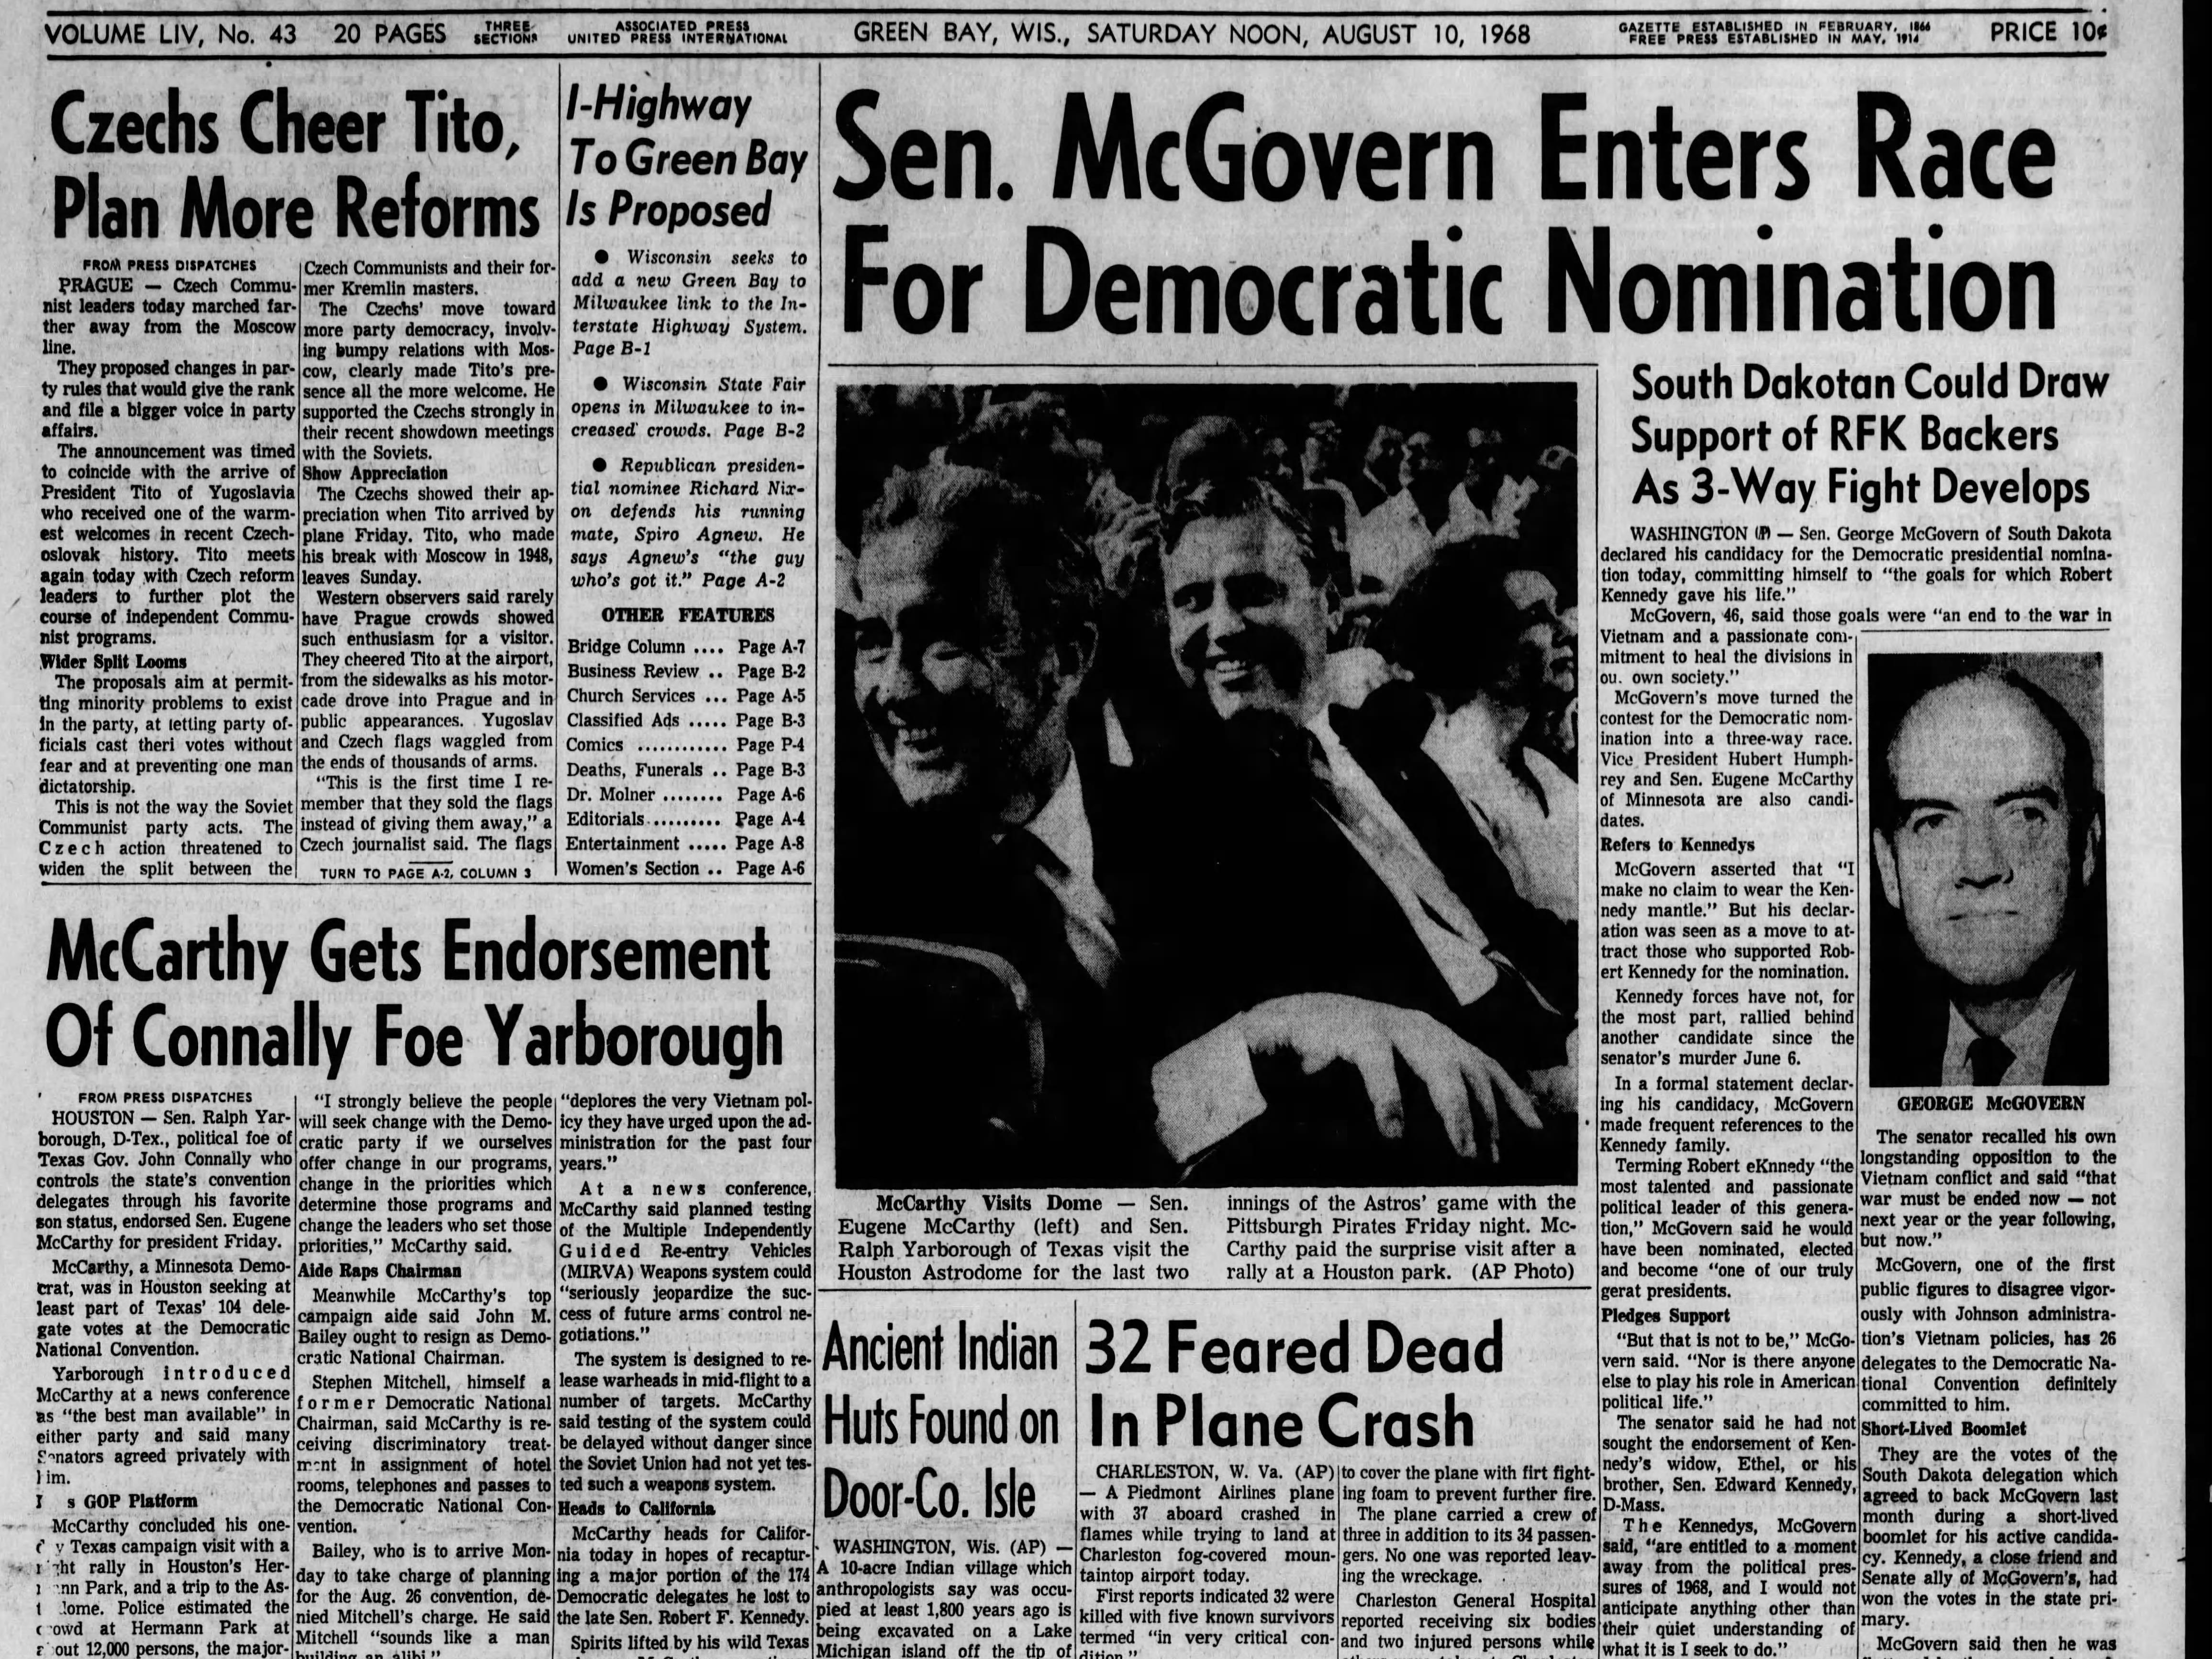 Aug. 10, 1968